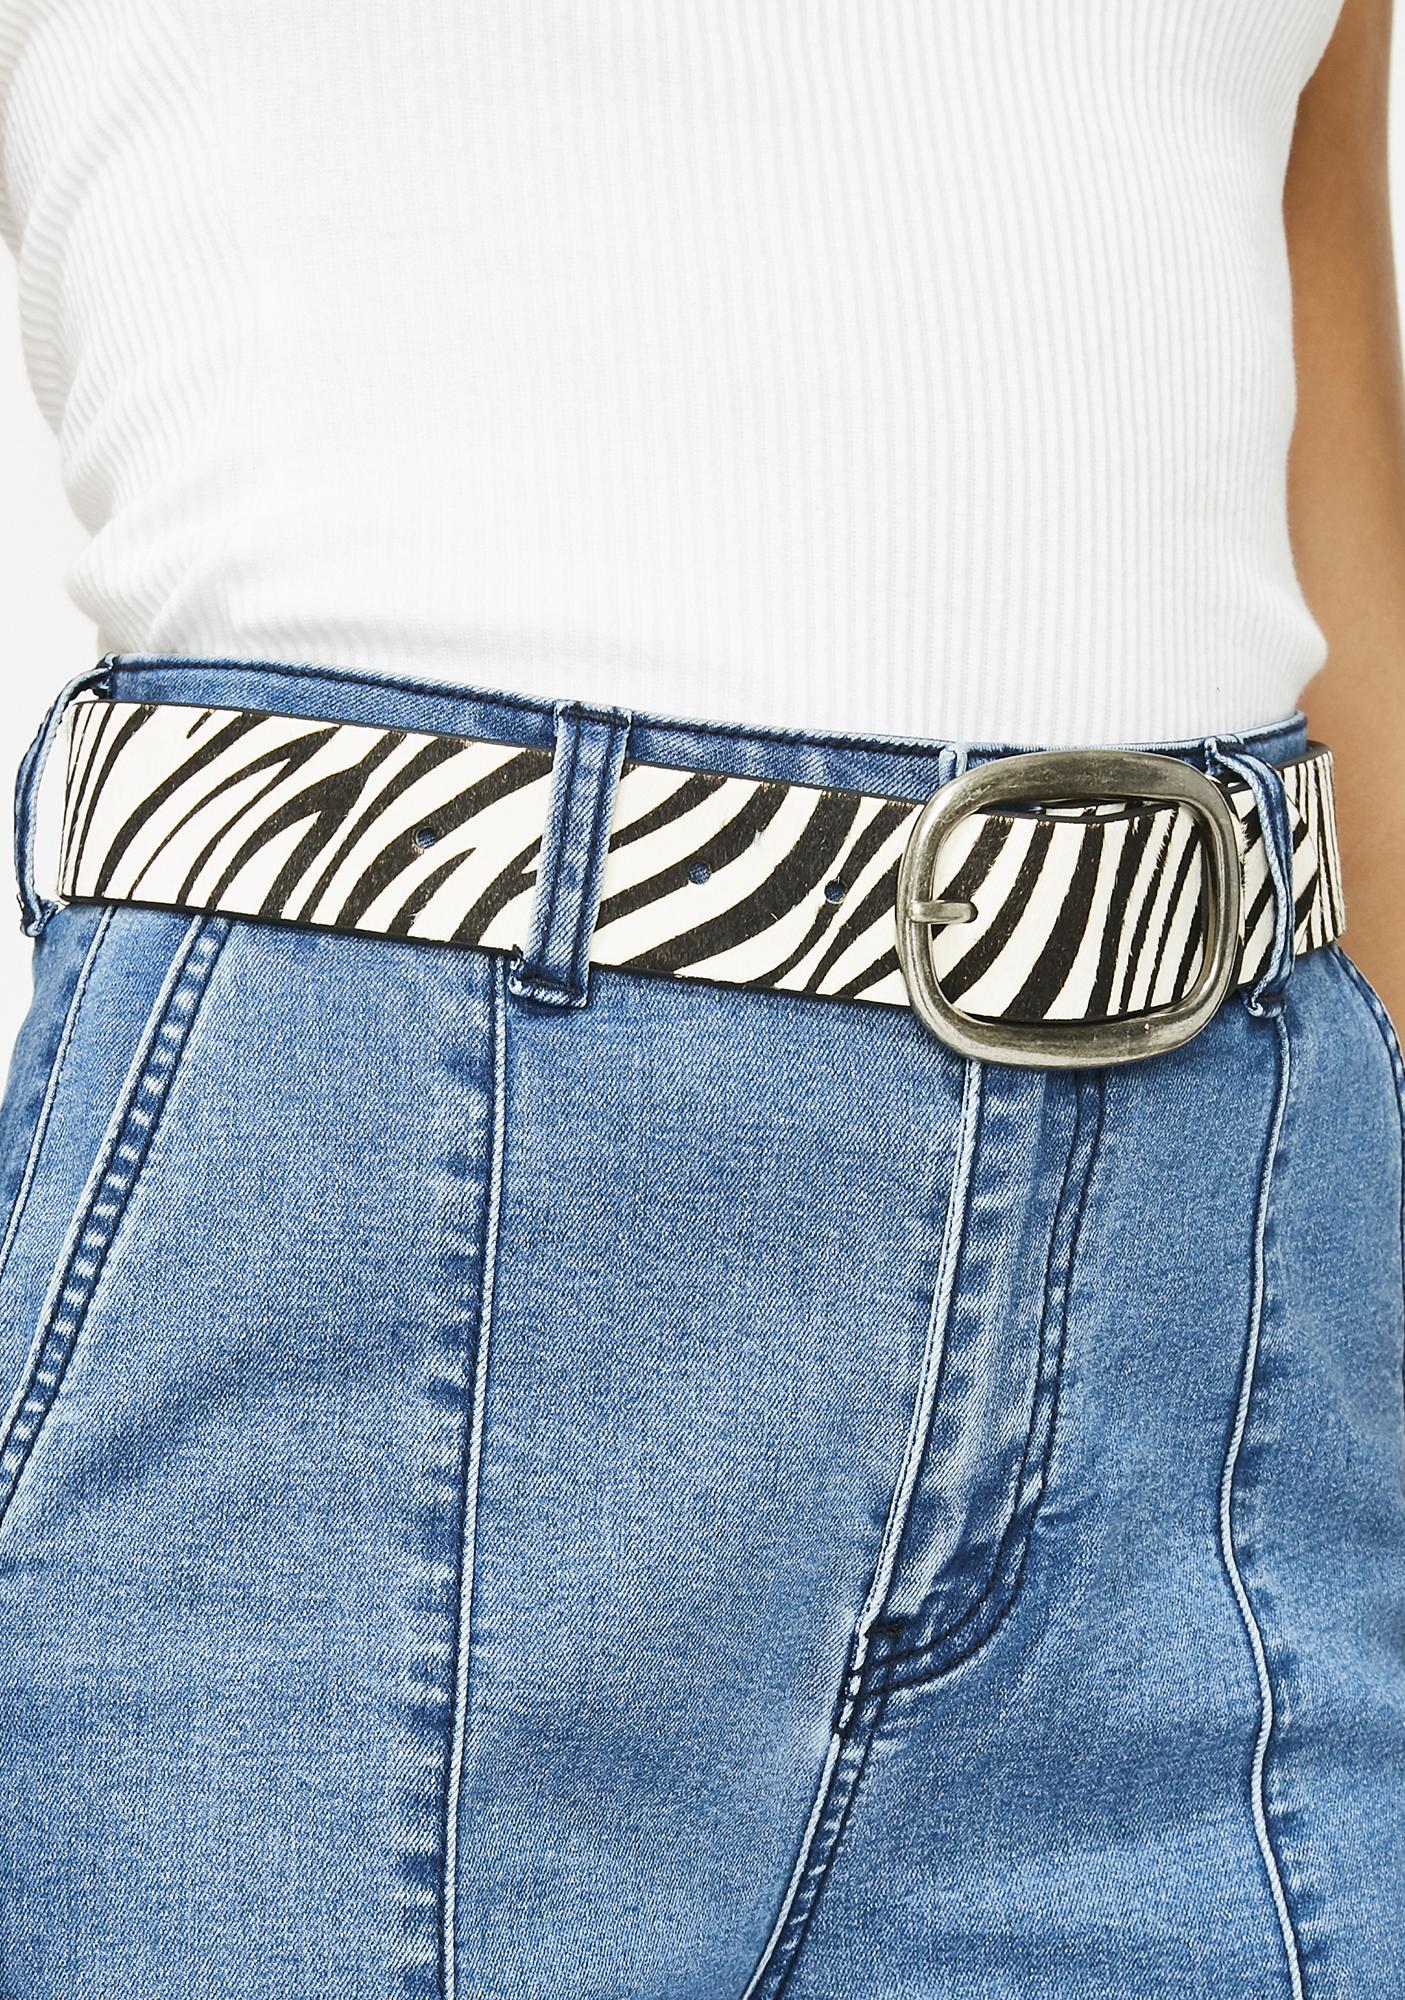 Set Me Free Zebra Belt